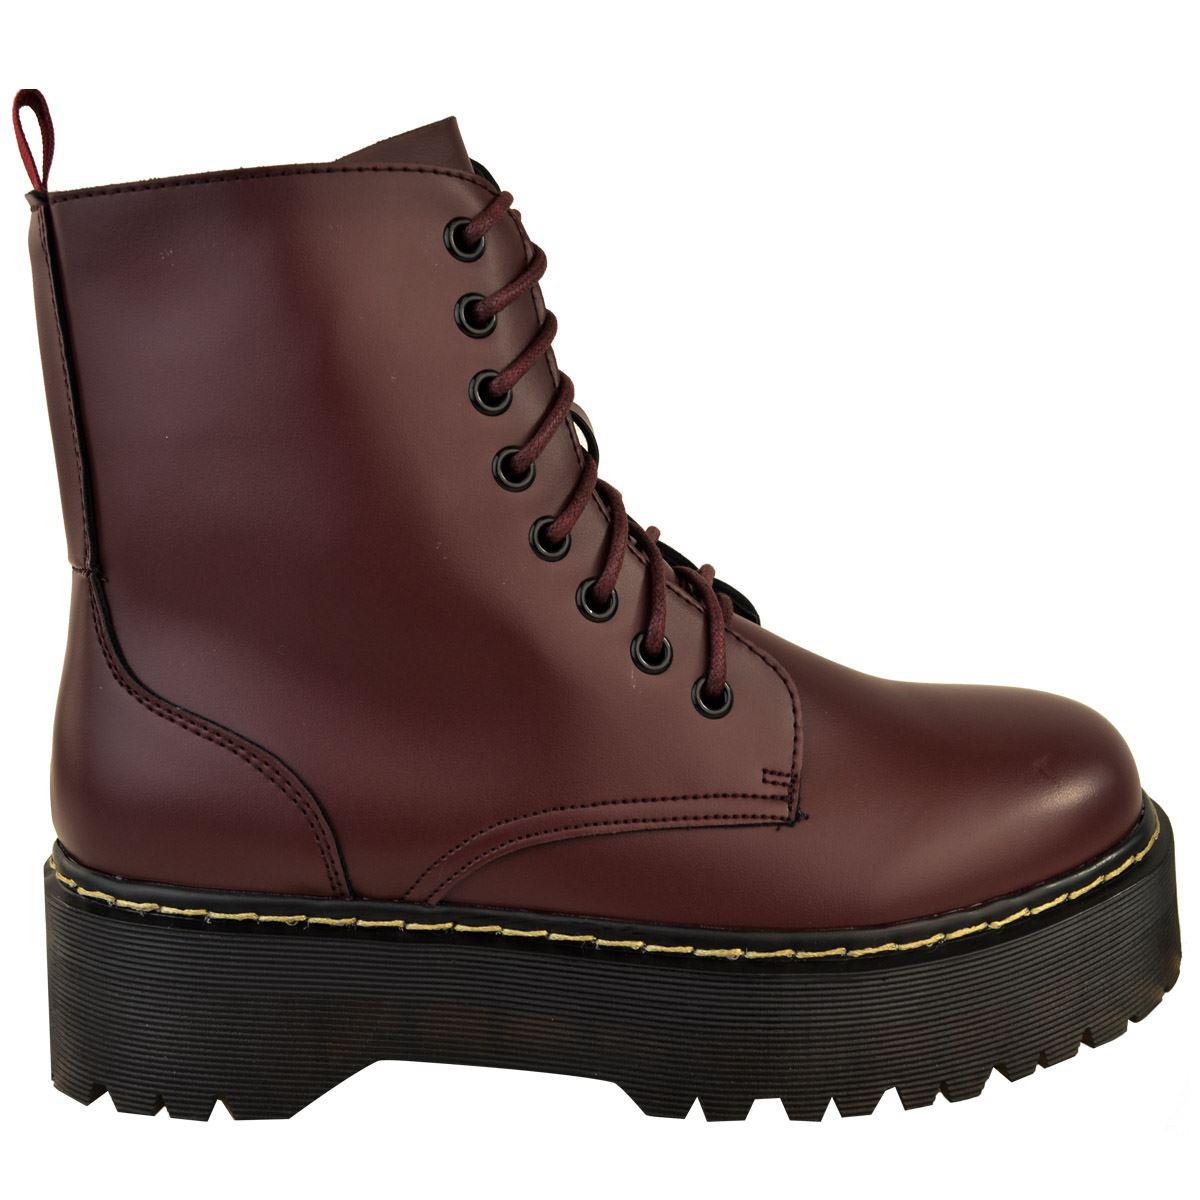 Womens-Ladies-Chunky-Lace-Up-Ankle-Boots-Platform-Icon-Retro-Goth-Punk-Black miniatuur 14